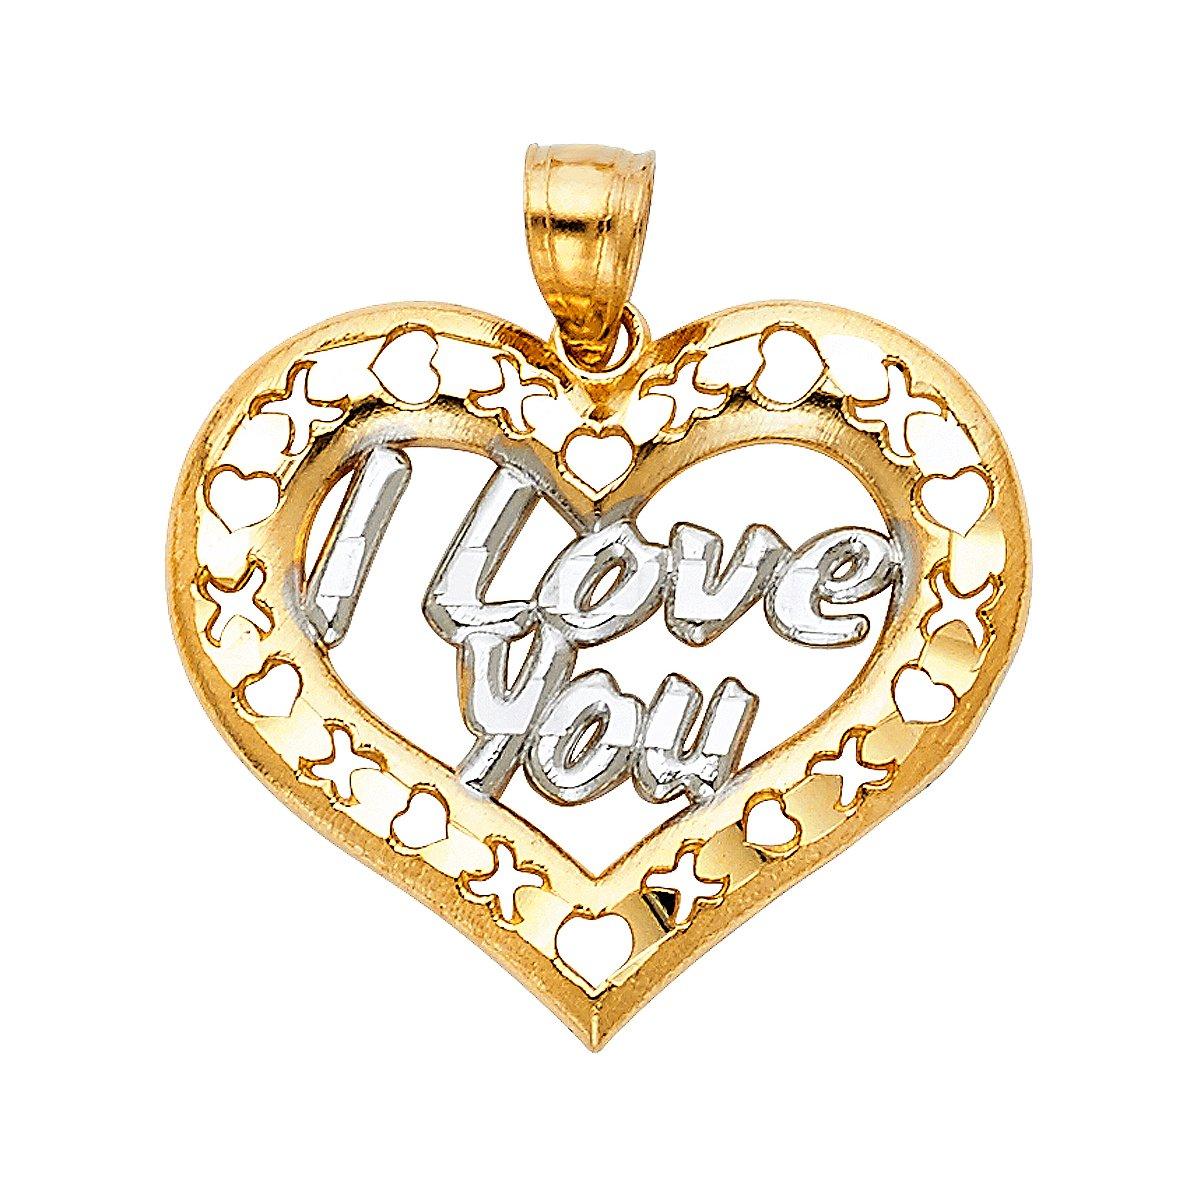 TGDJ 14K Yellow Gold I Love You Heart Pendant - Height 23 MM Width 26 MM